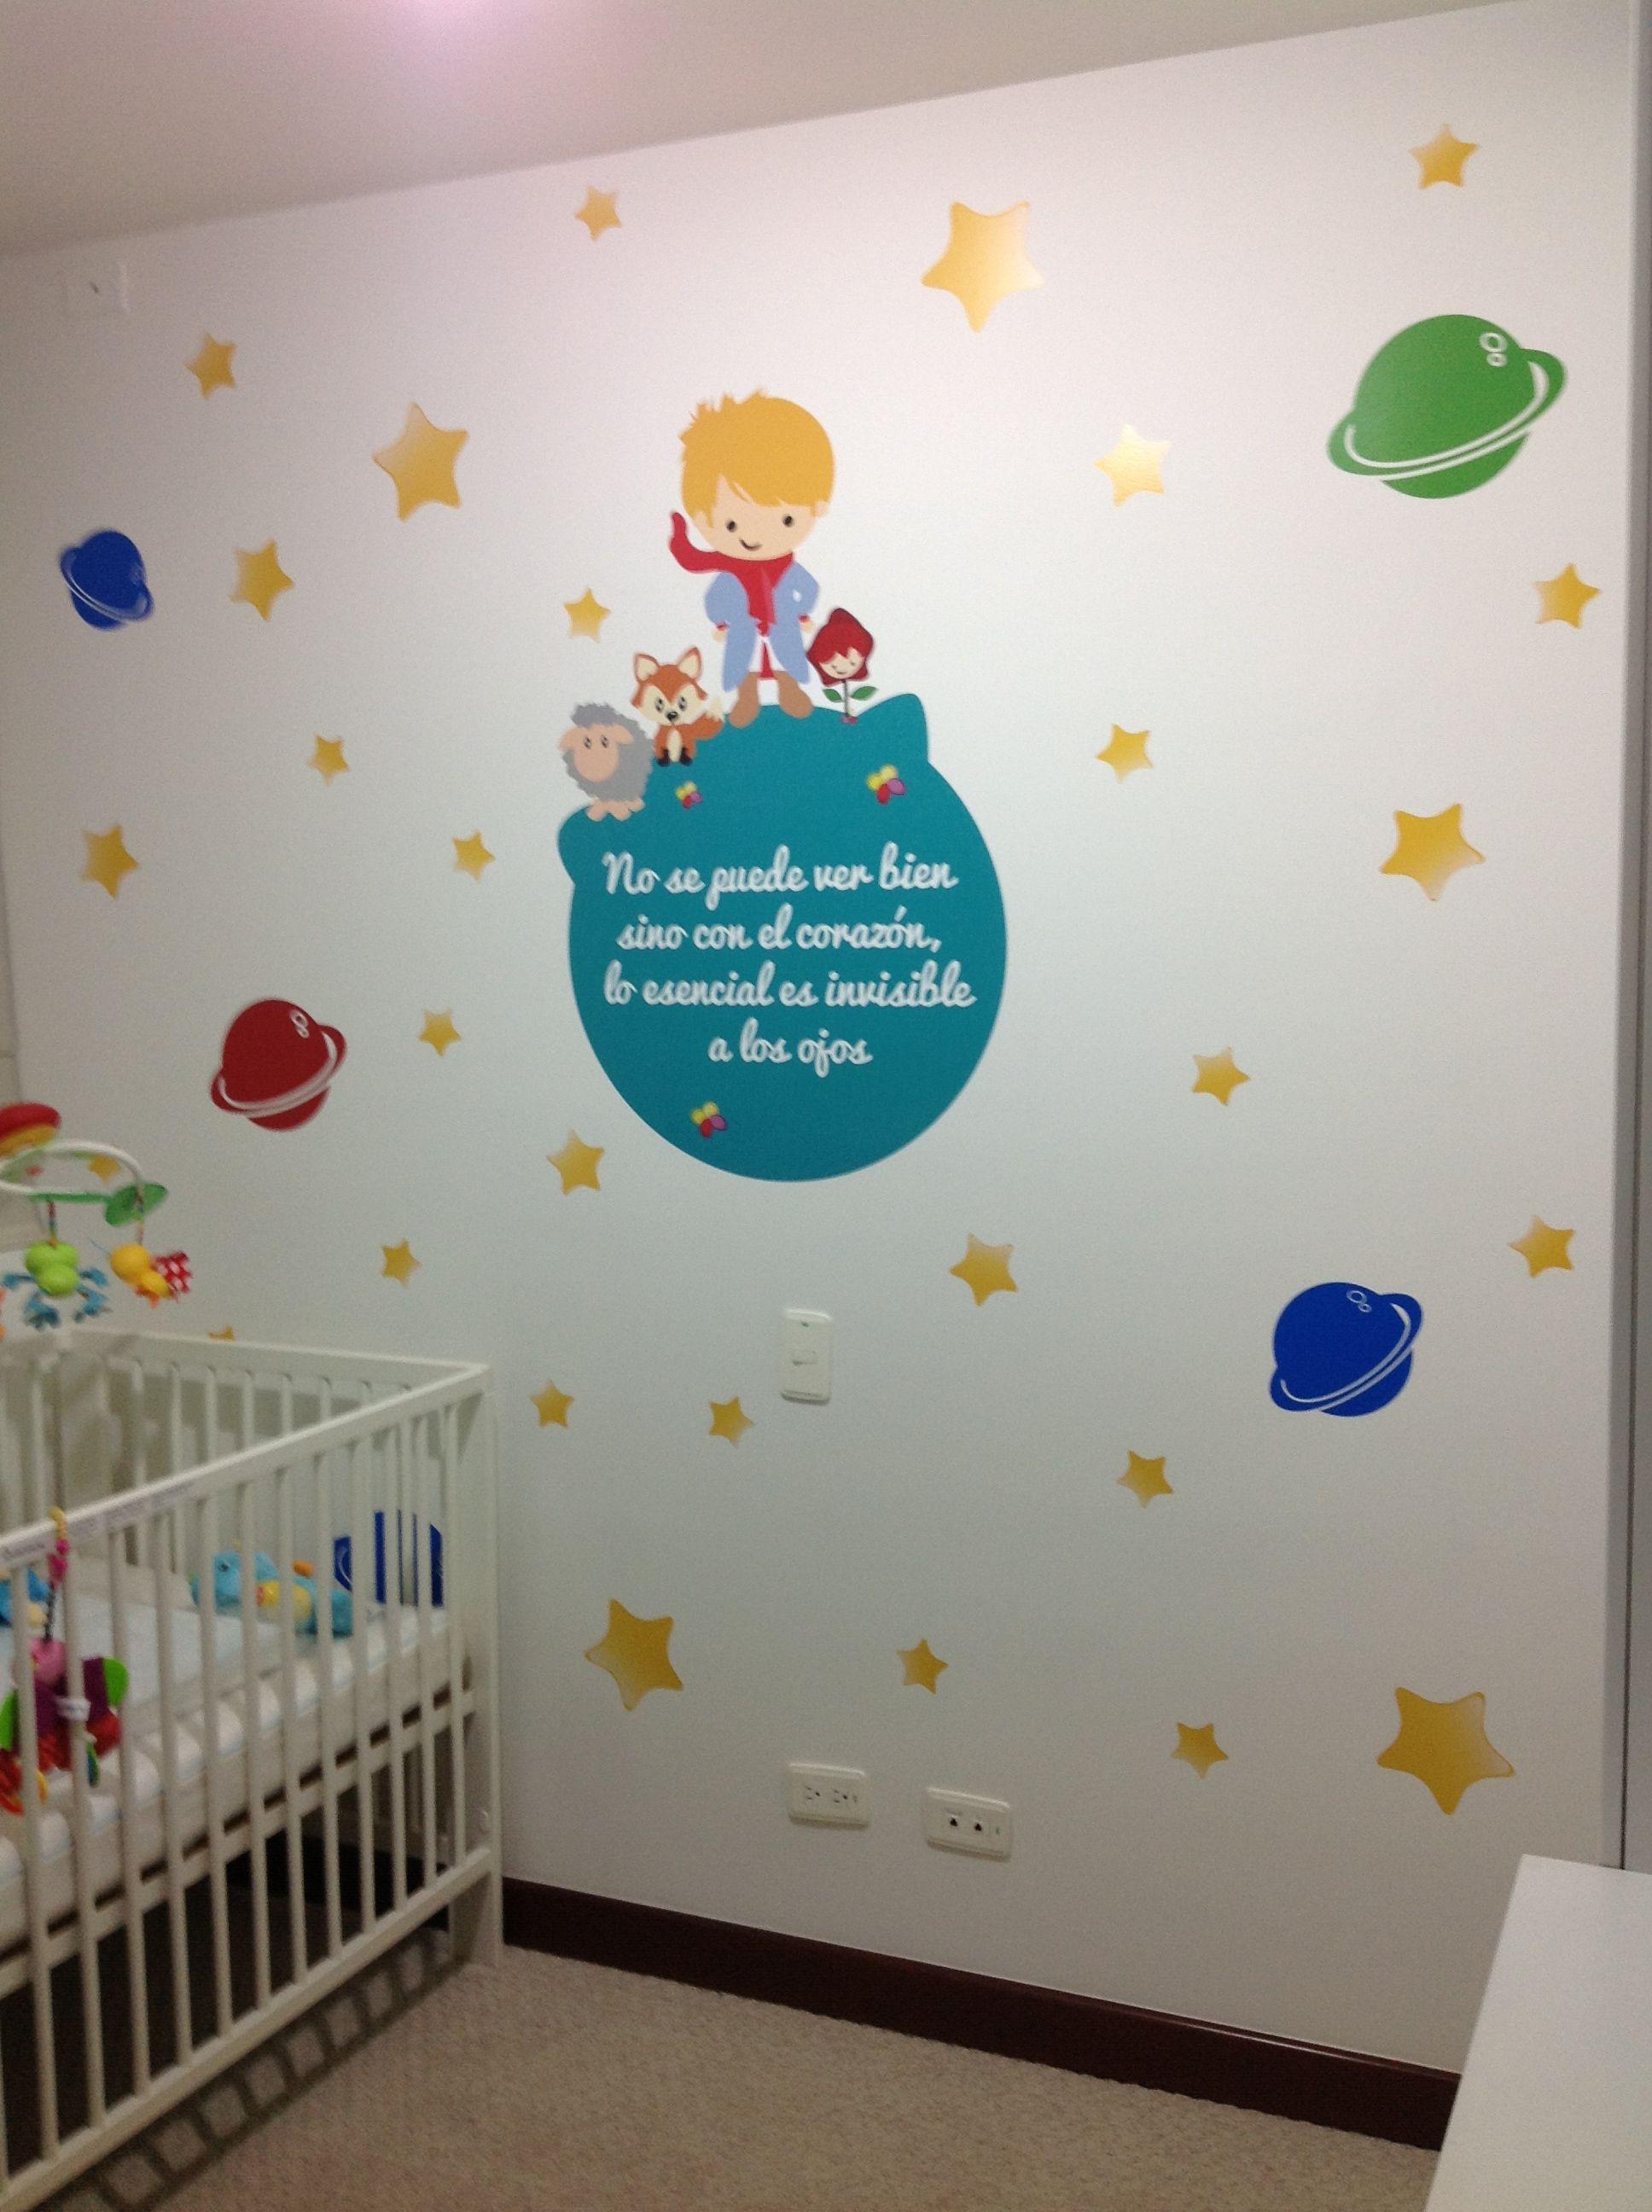 Decoraci n infantil principito vinilosdecorativos - Habitaciones infantiles decoracion paredes ...